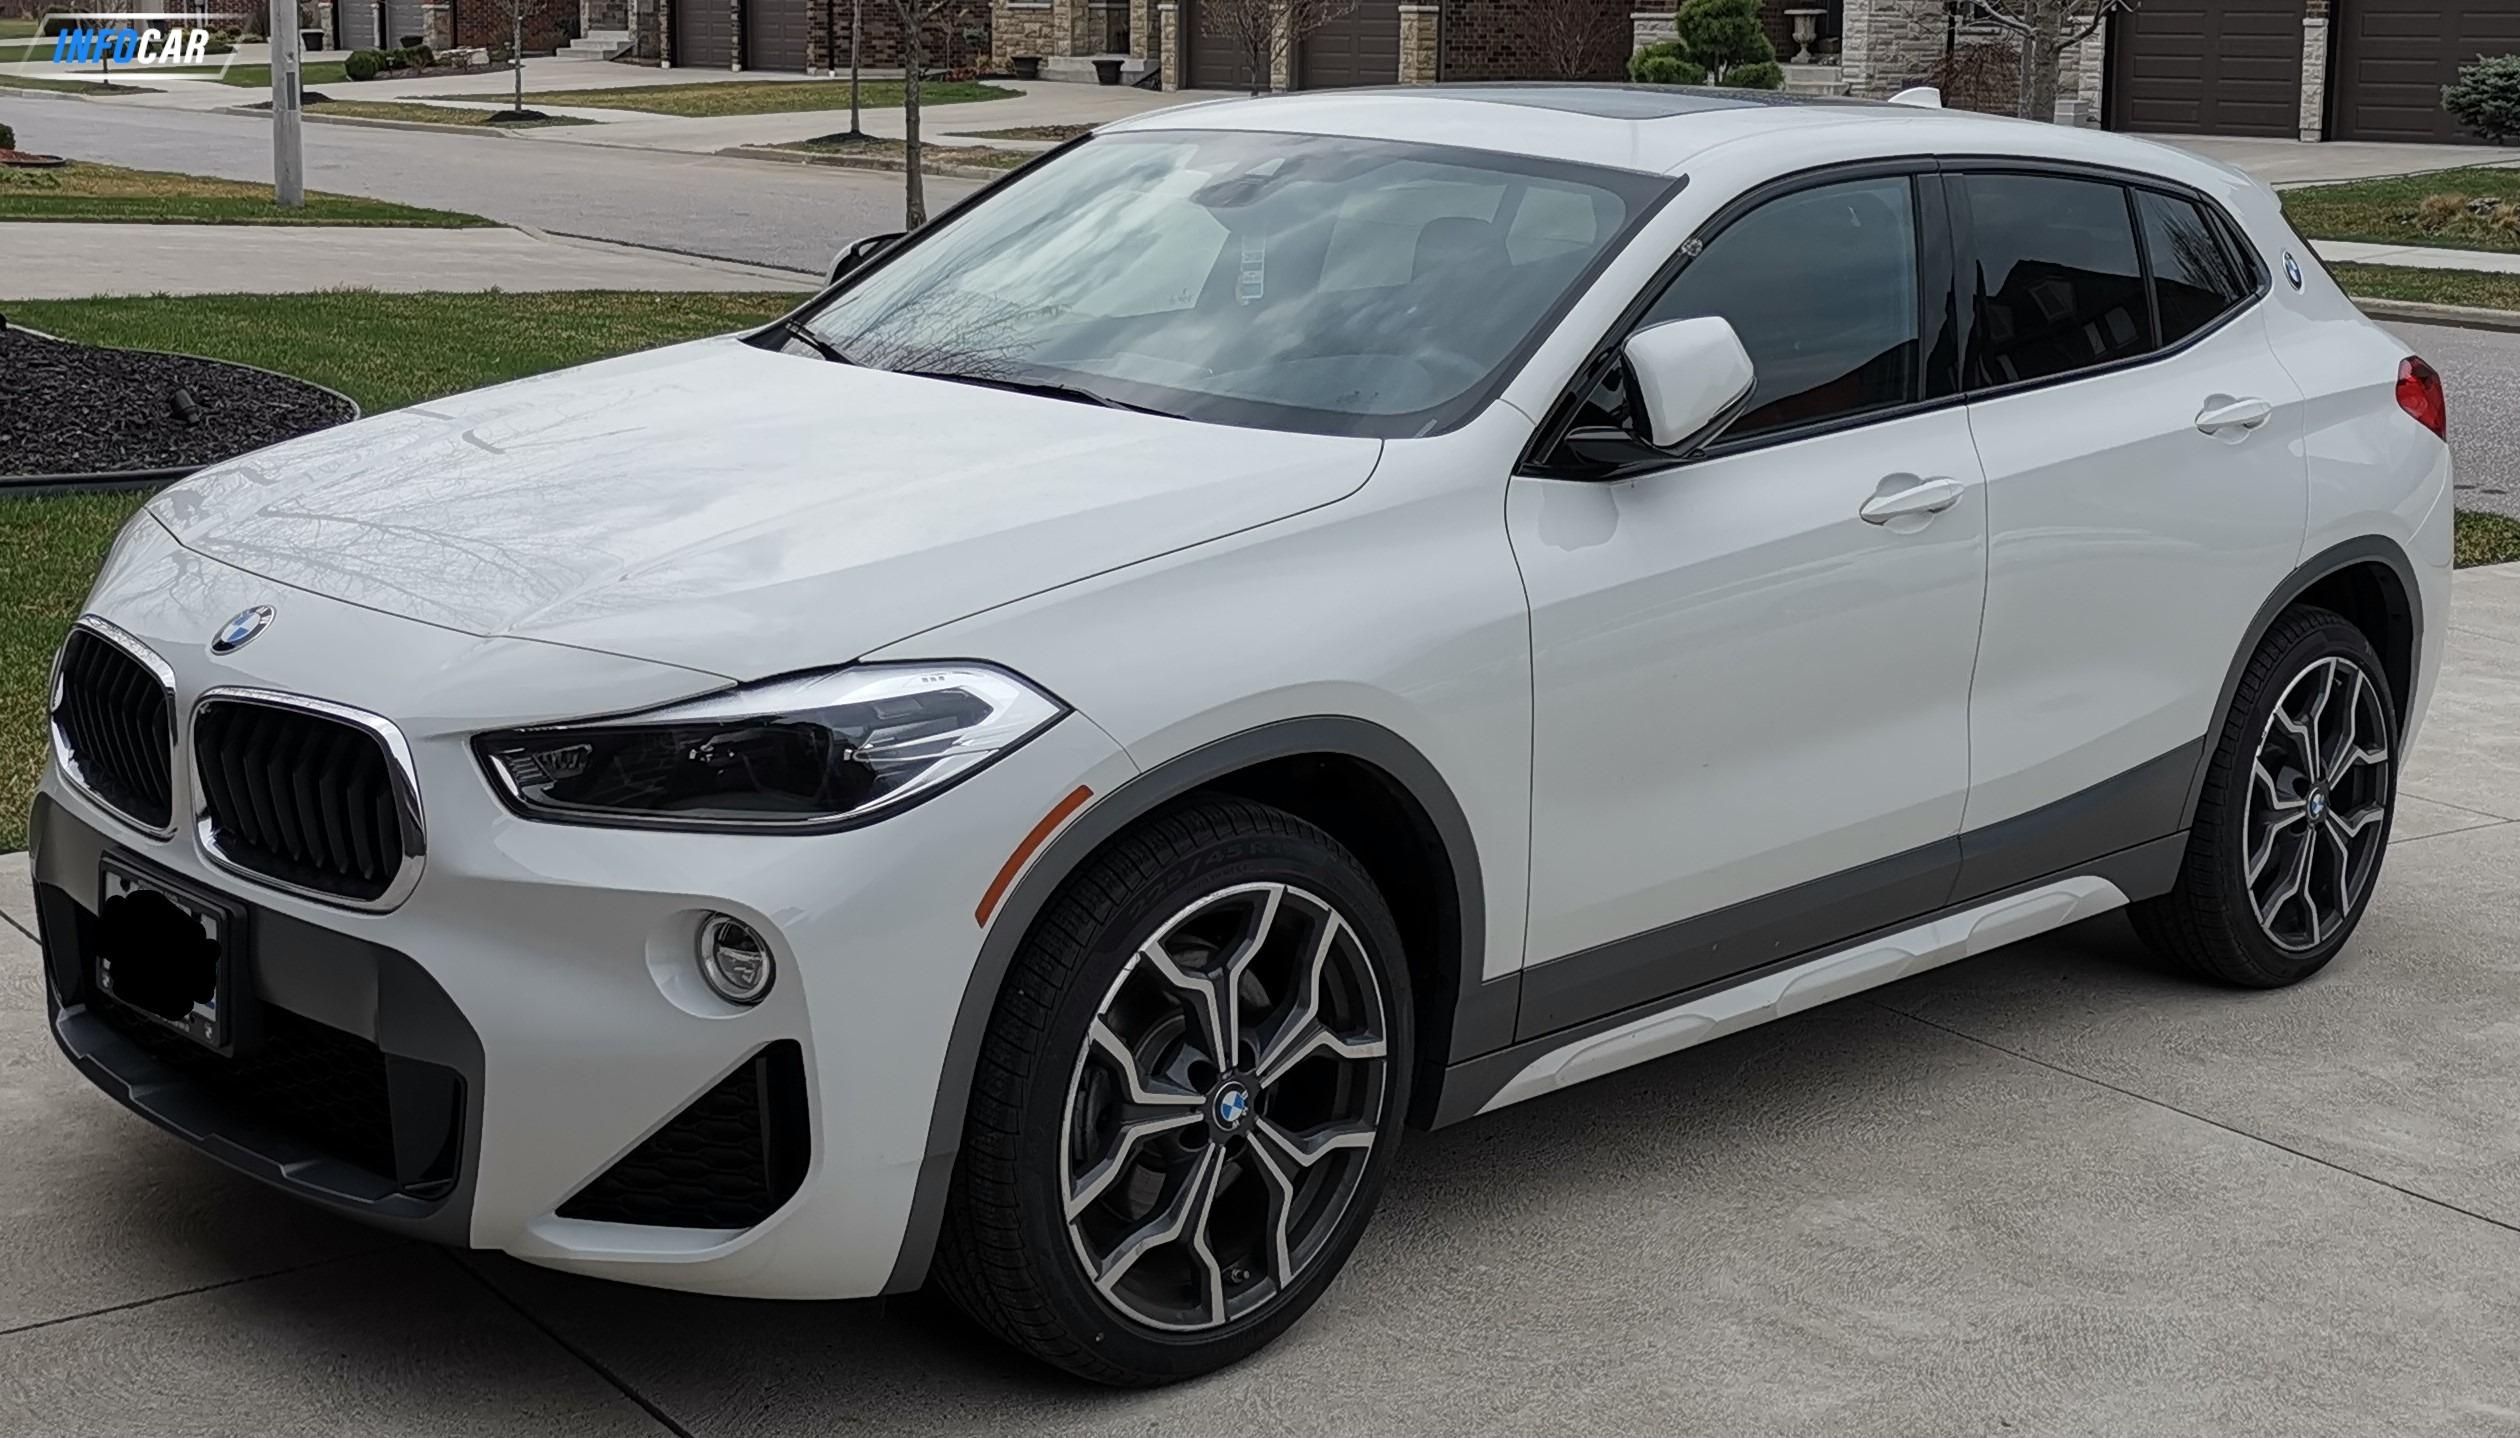 2018 BMW X2 x drive 28i - INFOCAR - Toronto's Most Comprehensive New and Used Auto Trading Platform